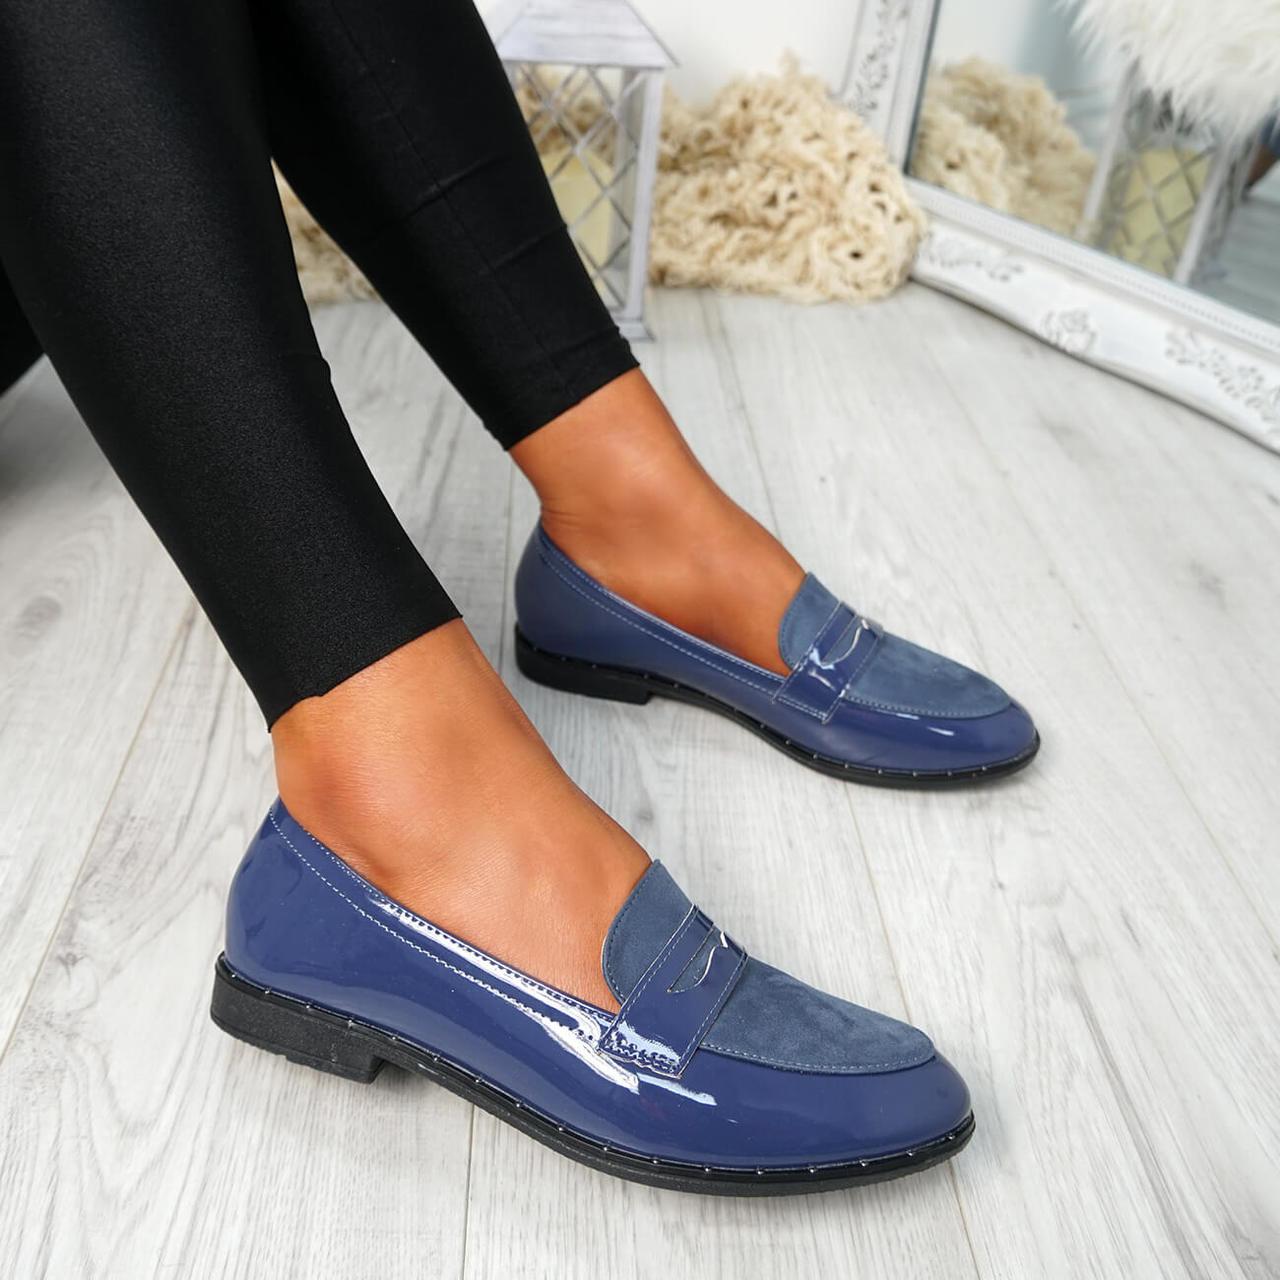 597956996 Womens Ladies Slip On Ballerinas Side Studded Leopard Patent Ballet Pumps  Shoes